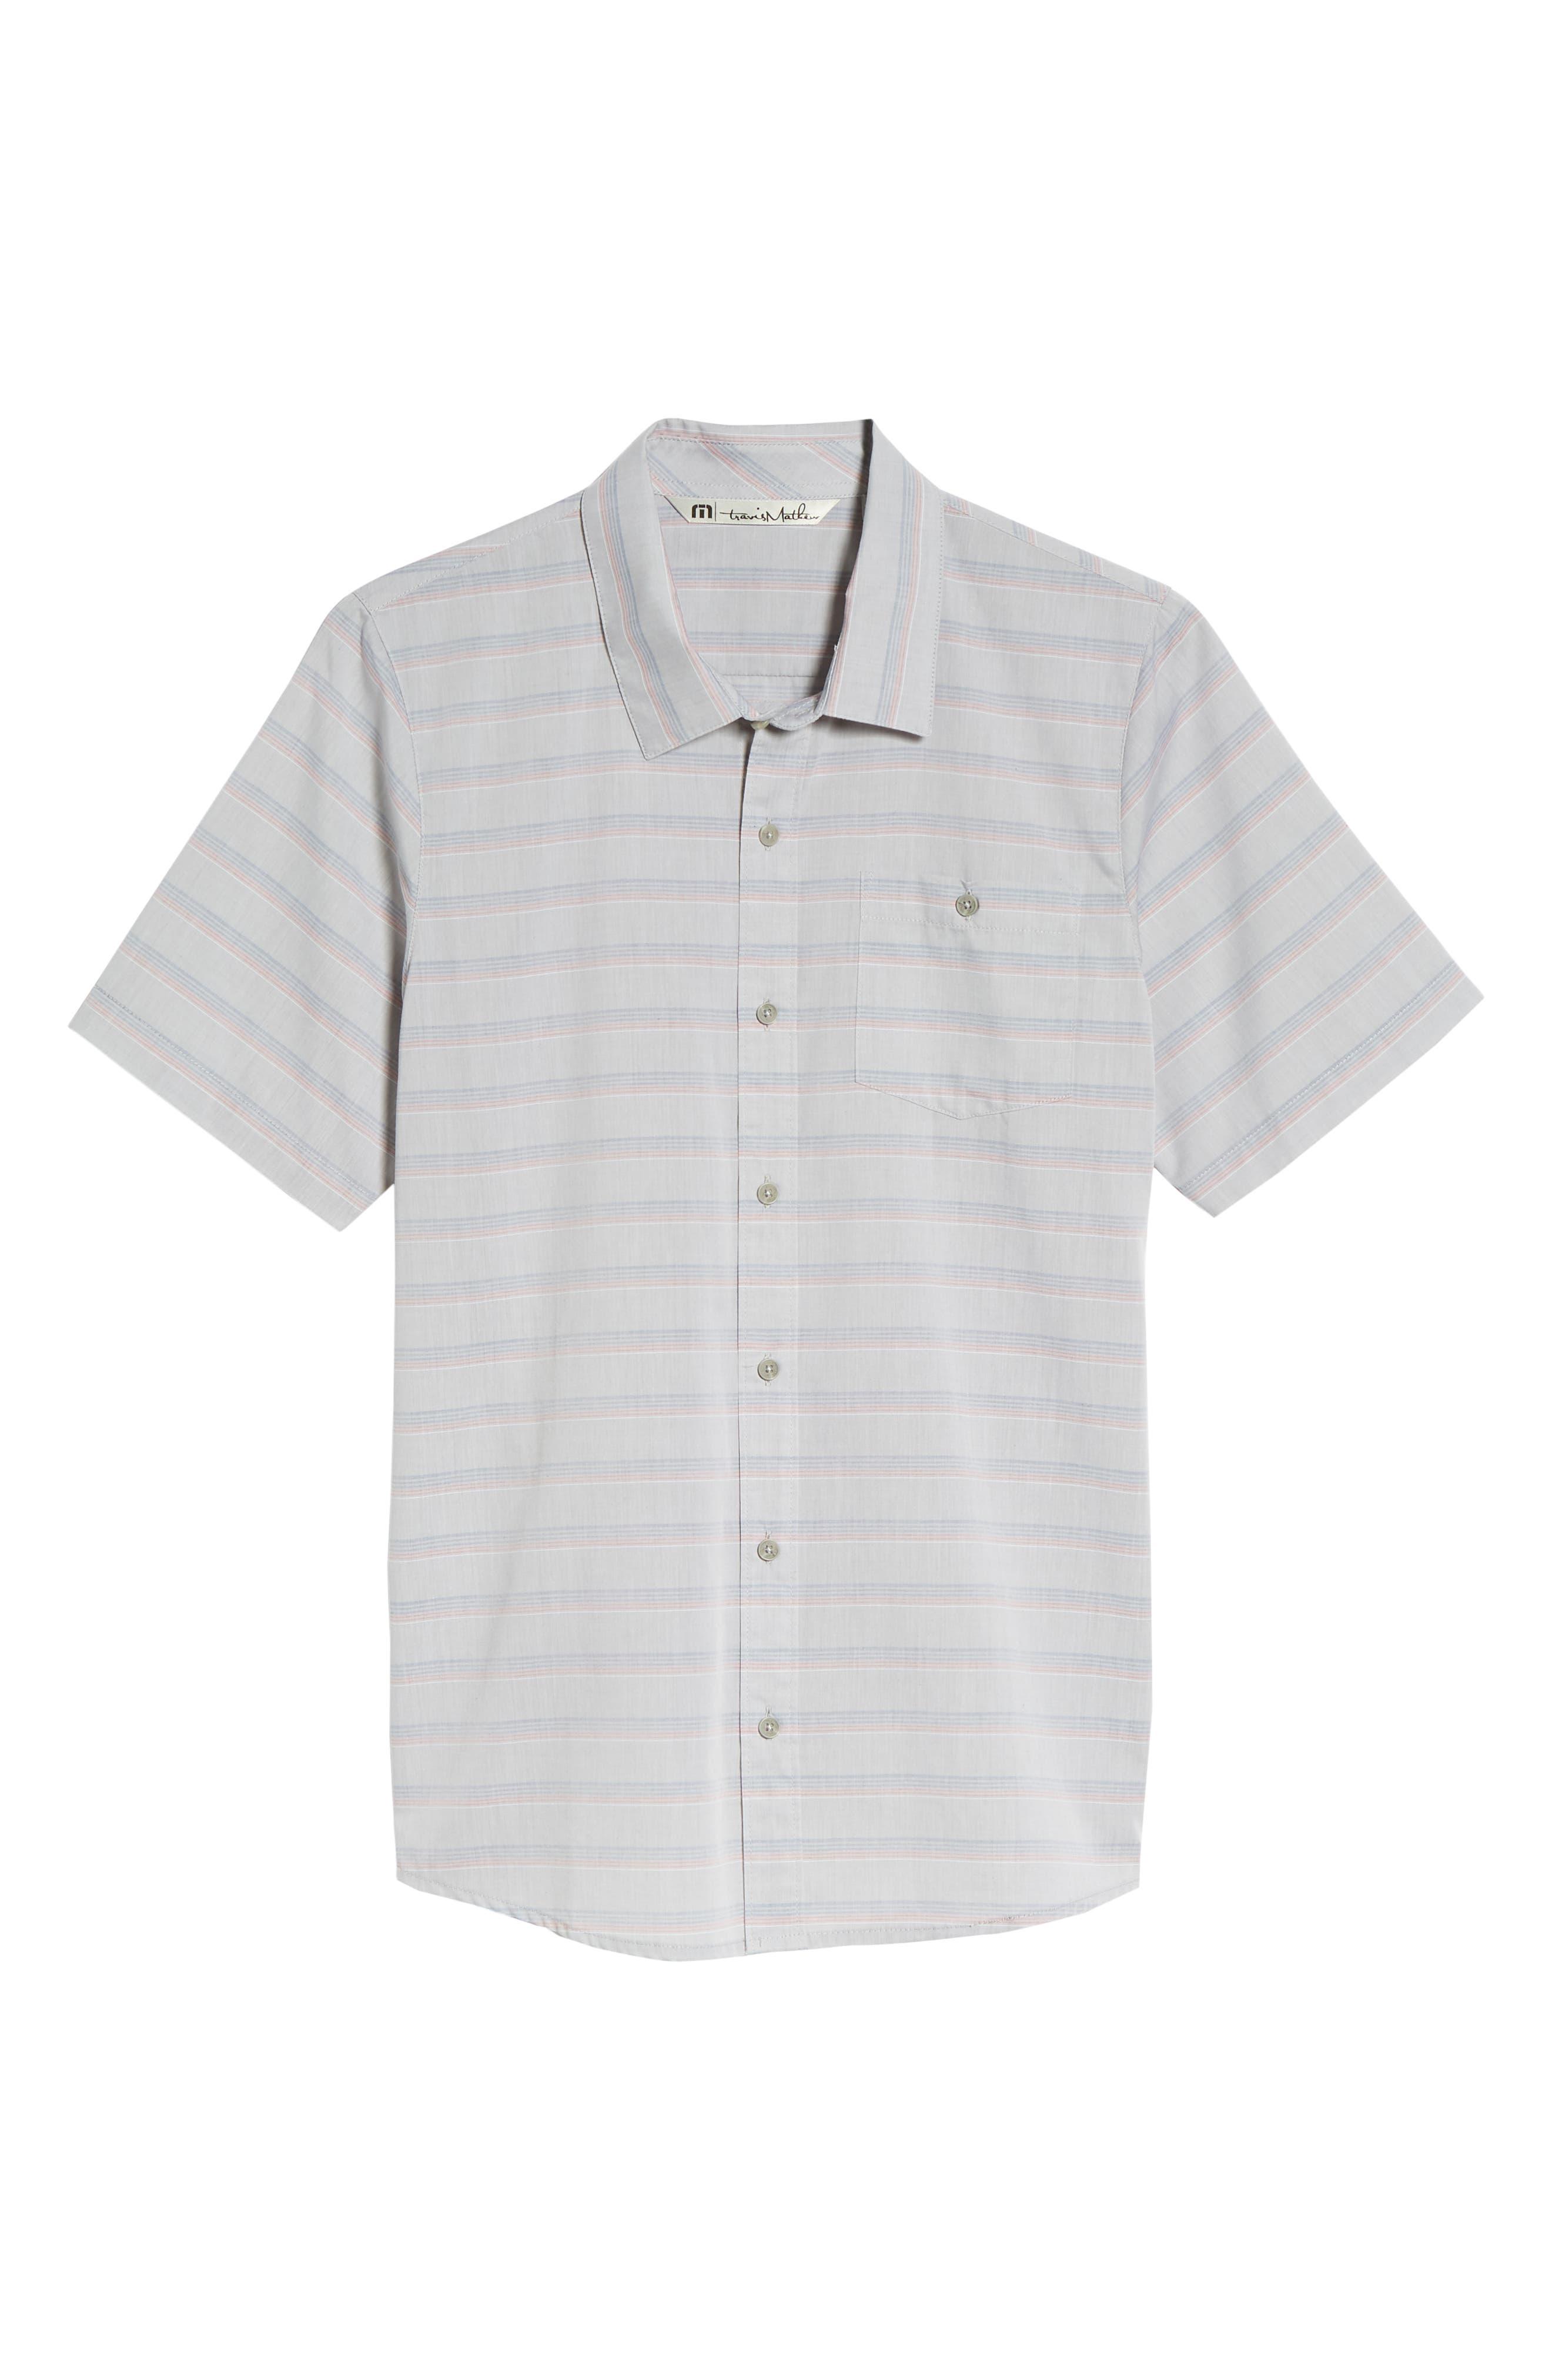 Comet Regular Fit Short Sleeve Sport Shirt,                             Alternate thumbnail 6, color,                             020